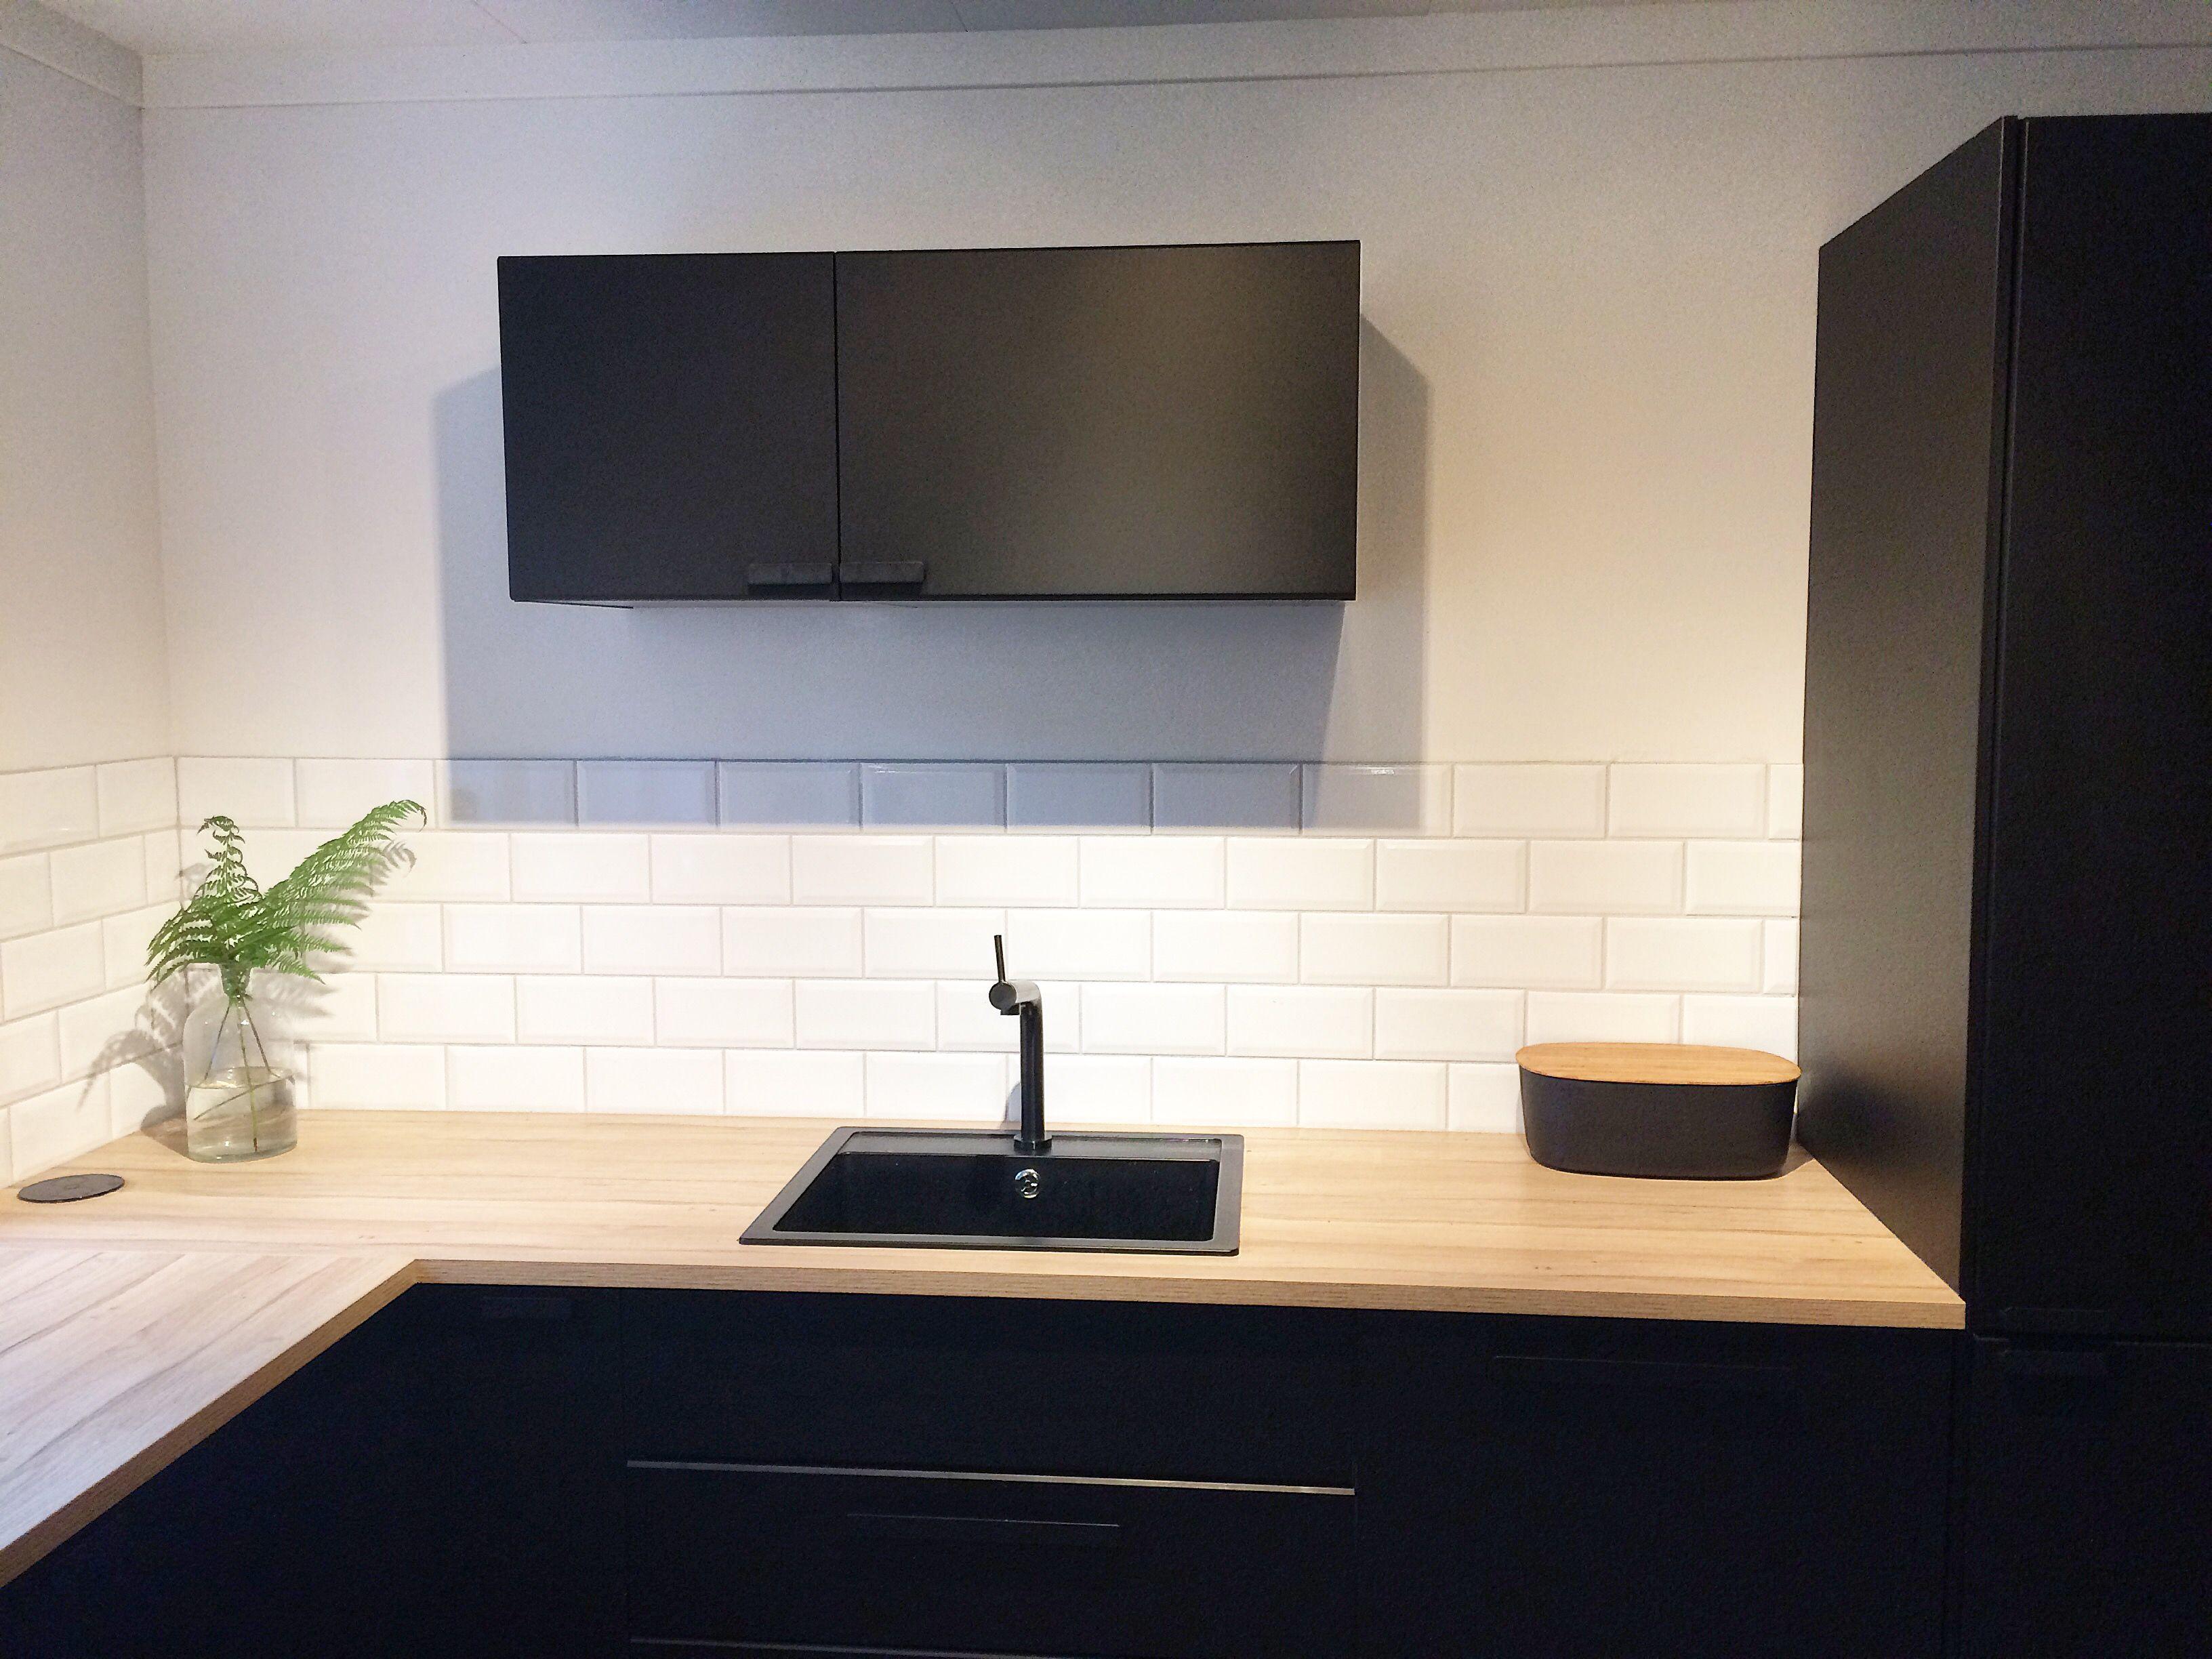 Ikea Kungsbacka cuisine Pinterest Kitchens, Black